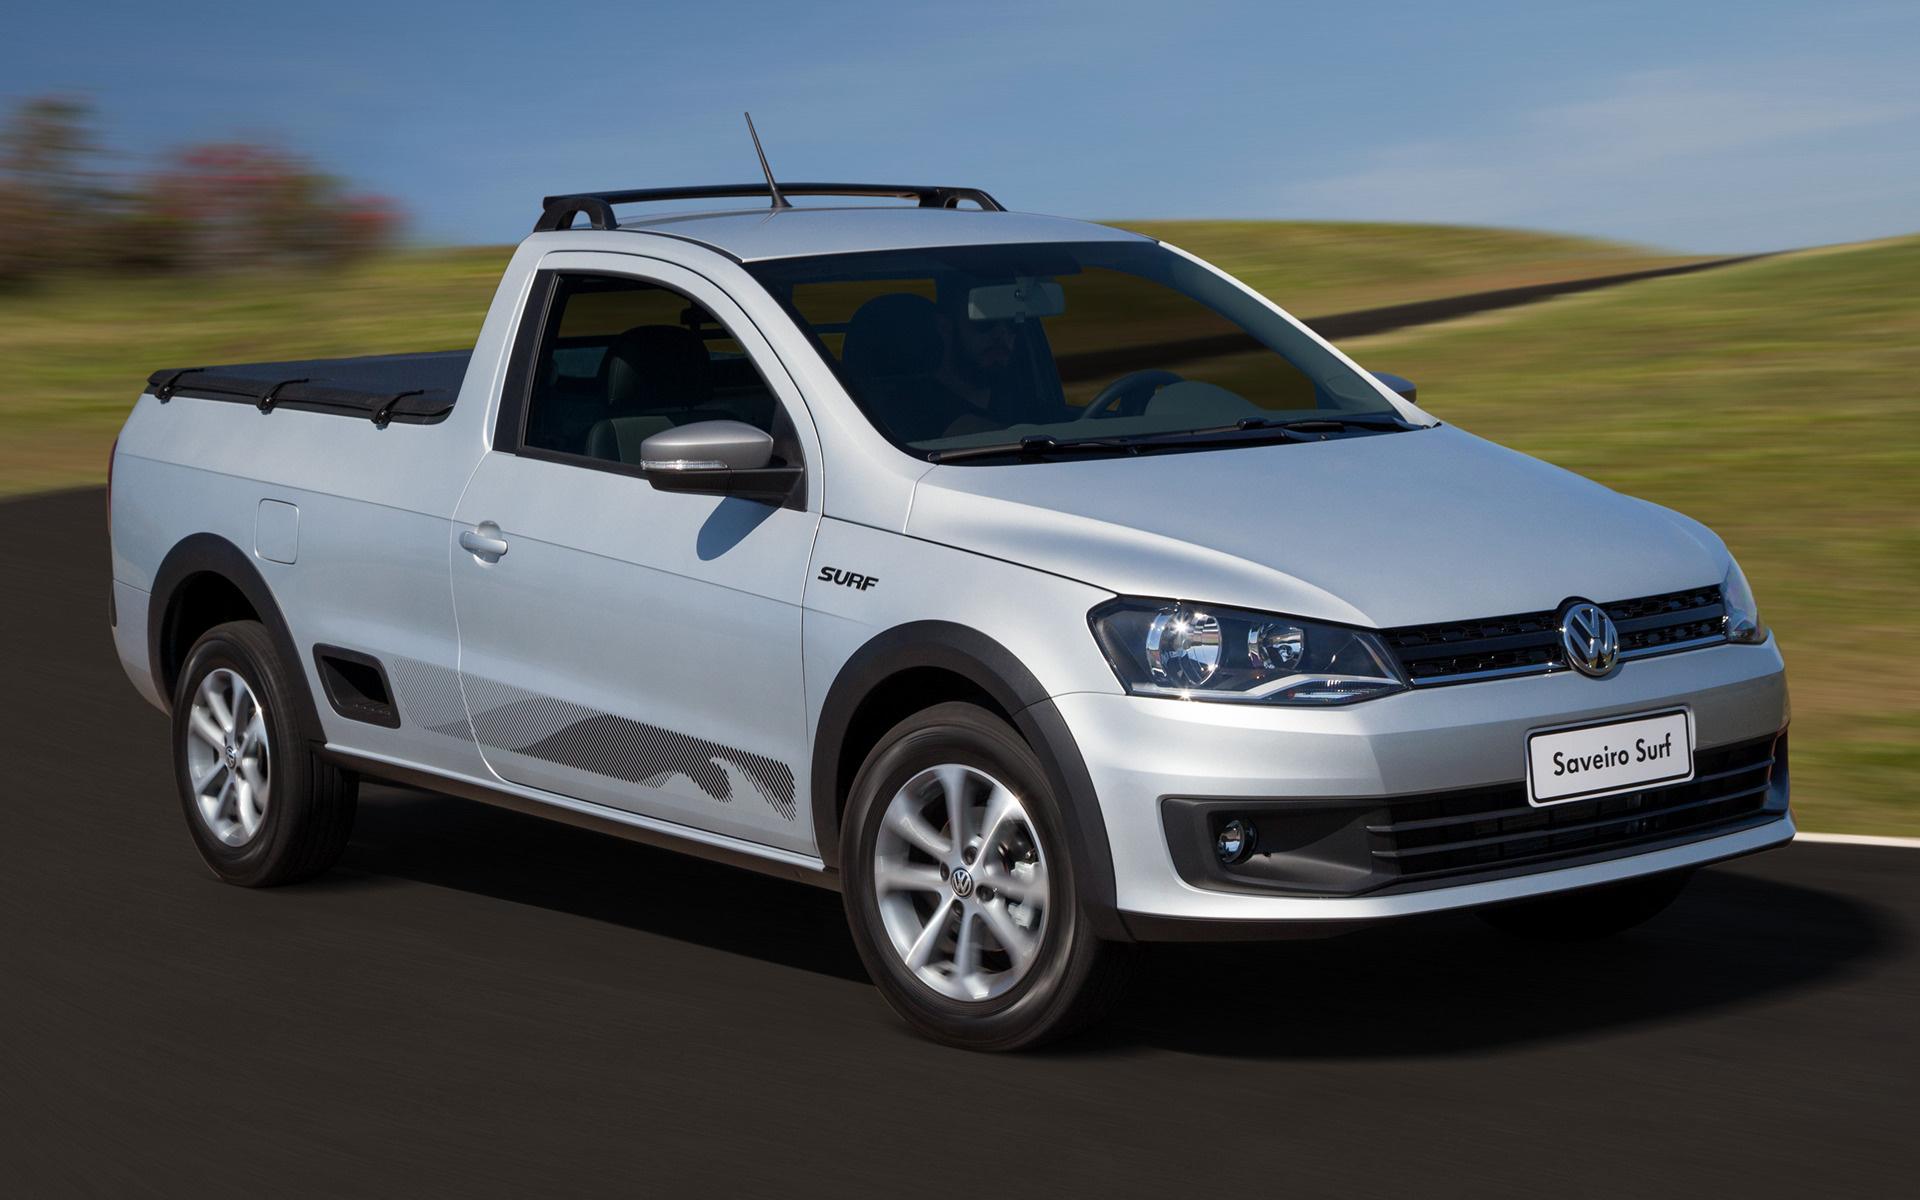 2015 Volkswagen Saveiro CS Surf - Wallpapers and HD Images | Car Pixel